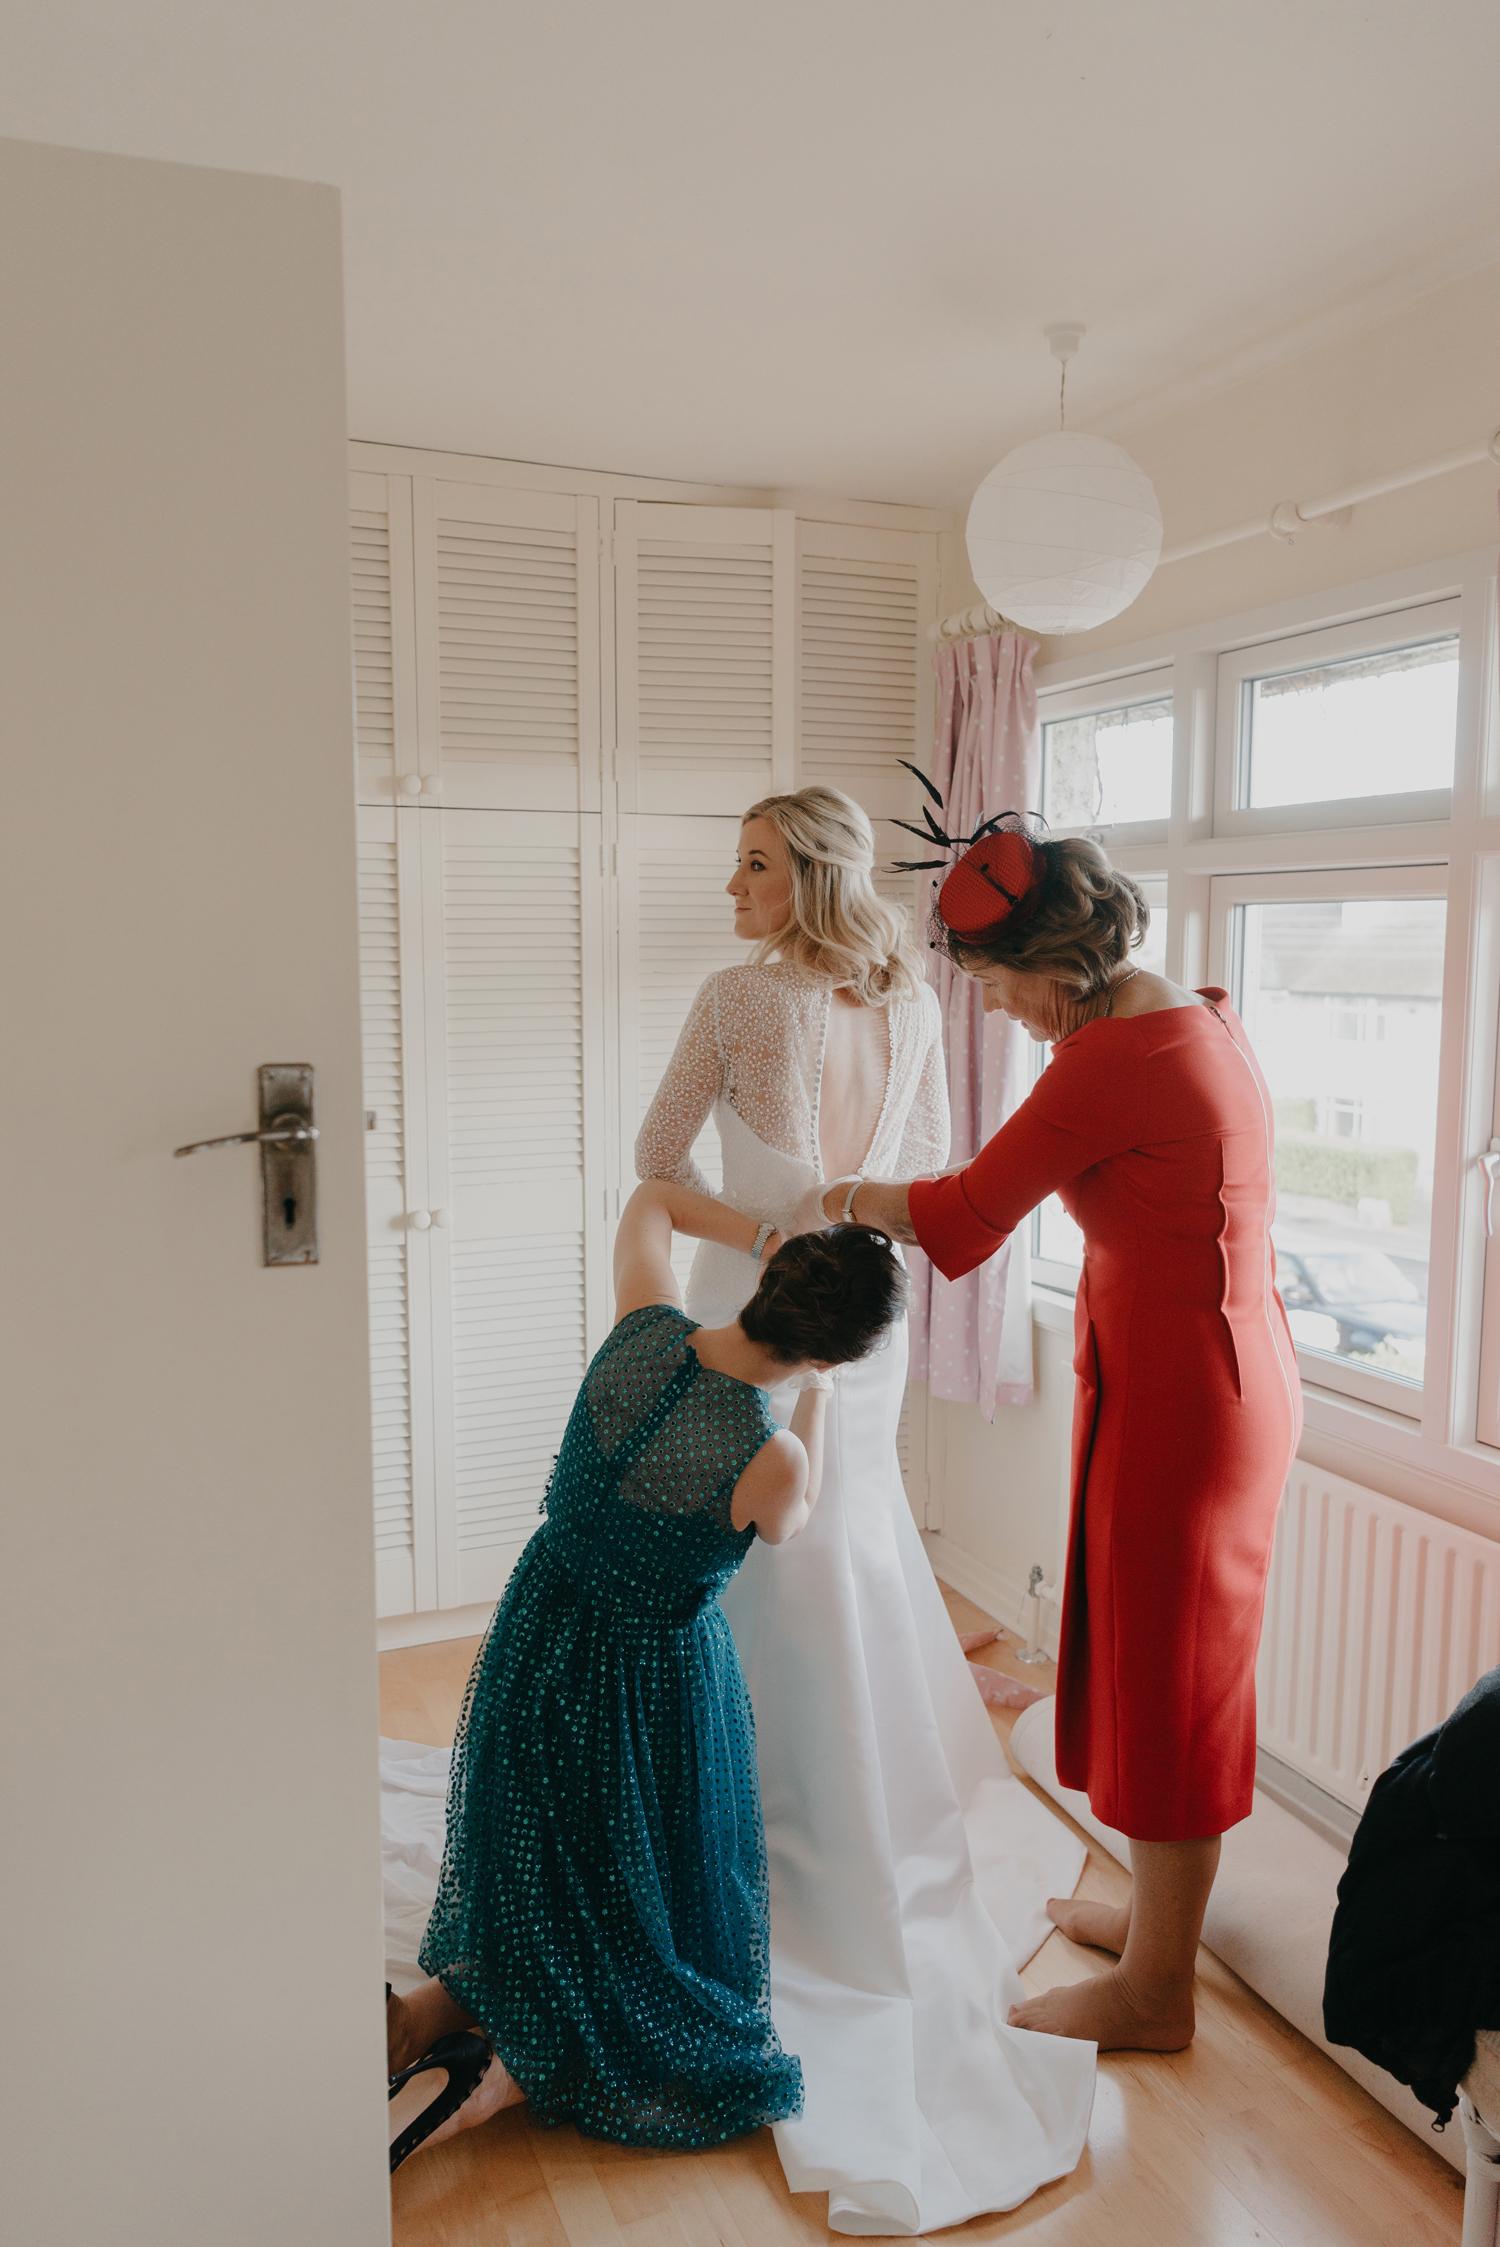 clonwilliam-house-wedding-photographer-036.jpg